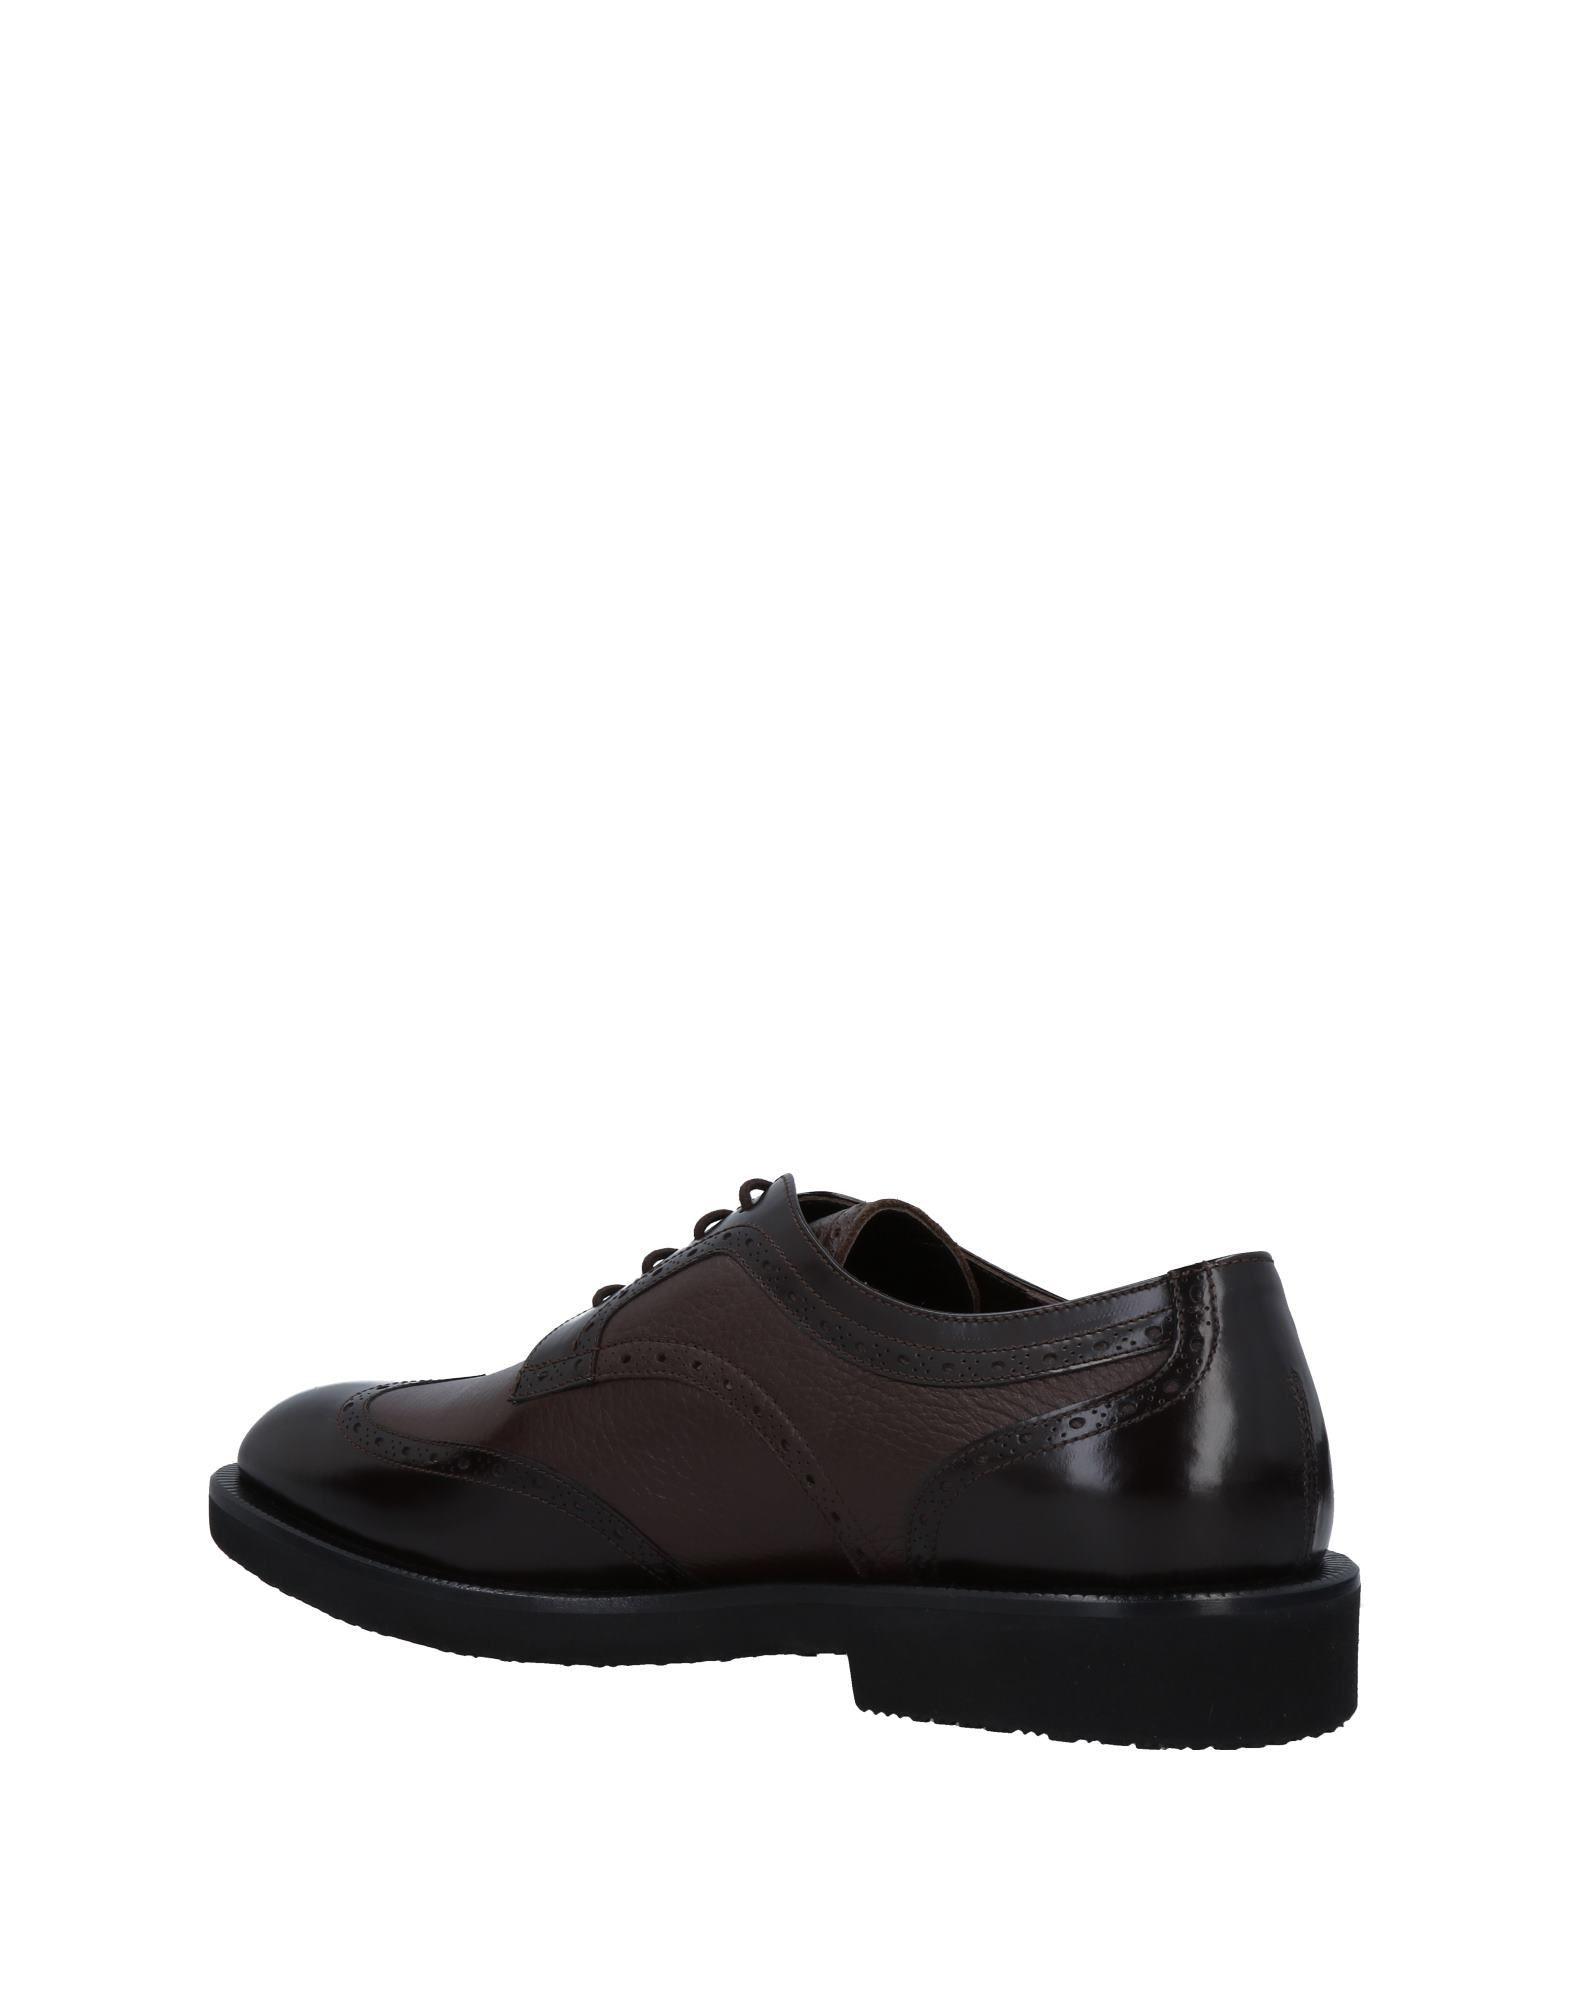 Bruno Magli Dark Brown Buck Leather Shoes